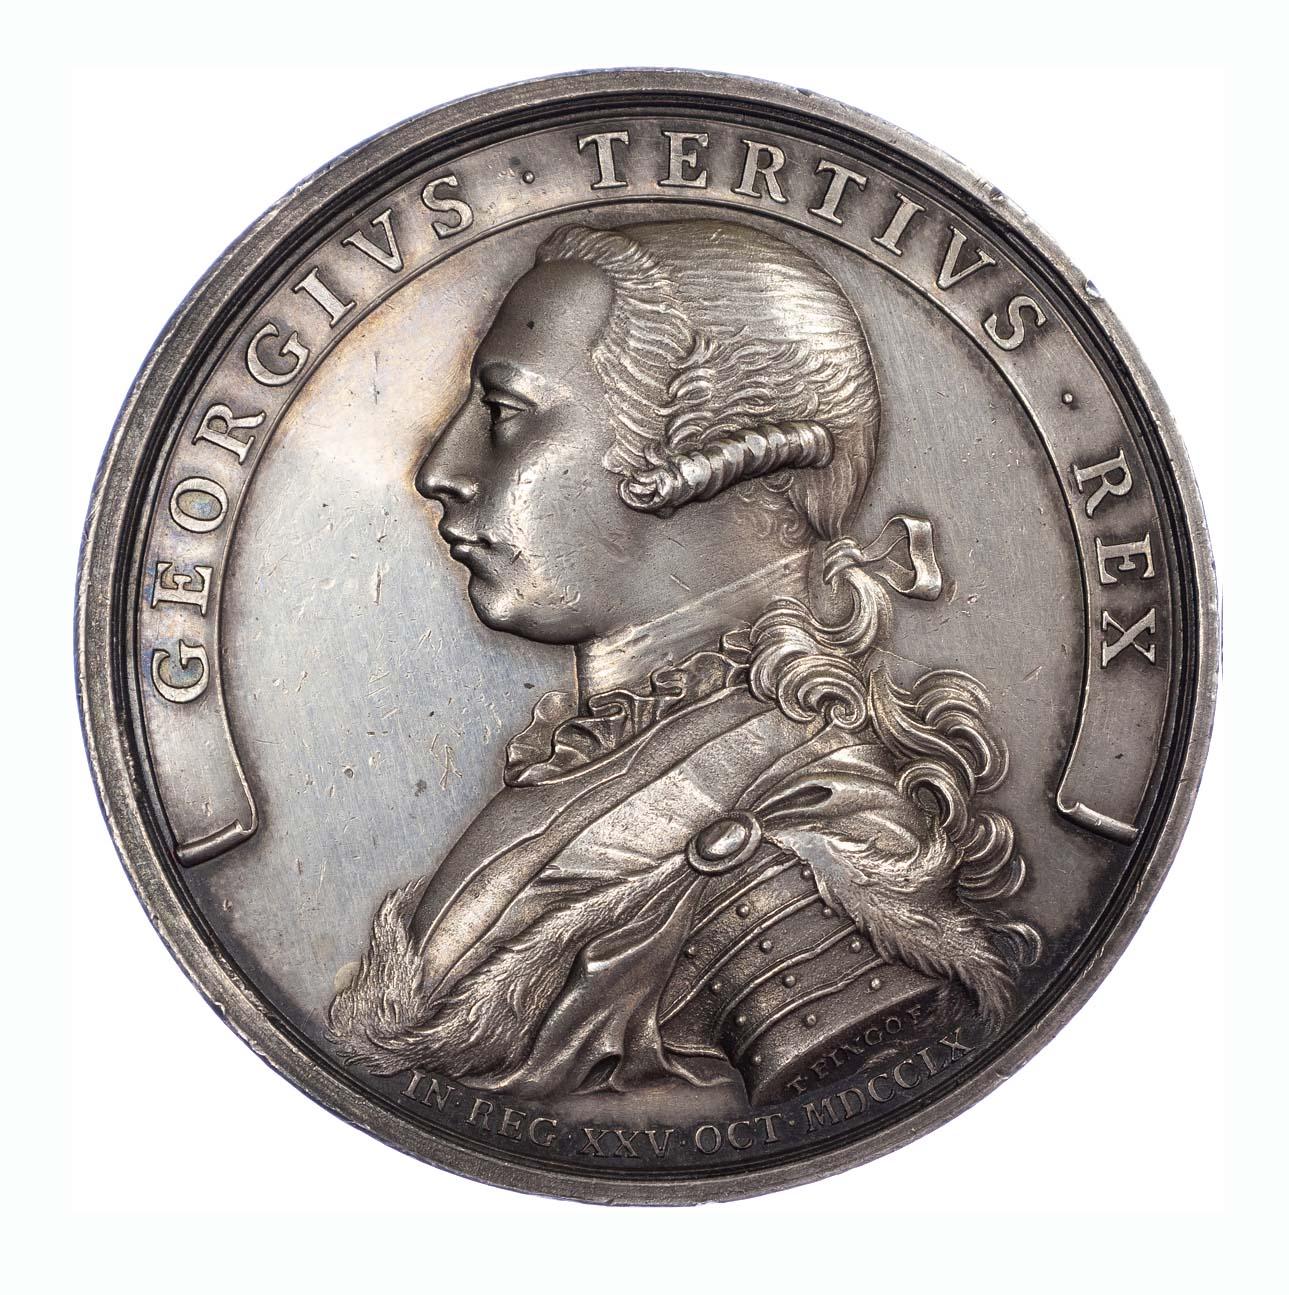 George III, accession AR medal, 1760